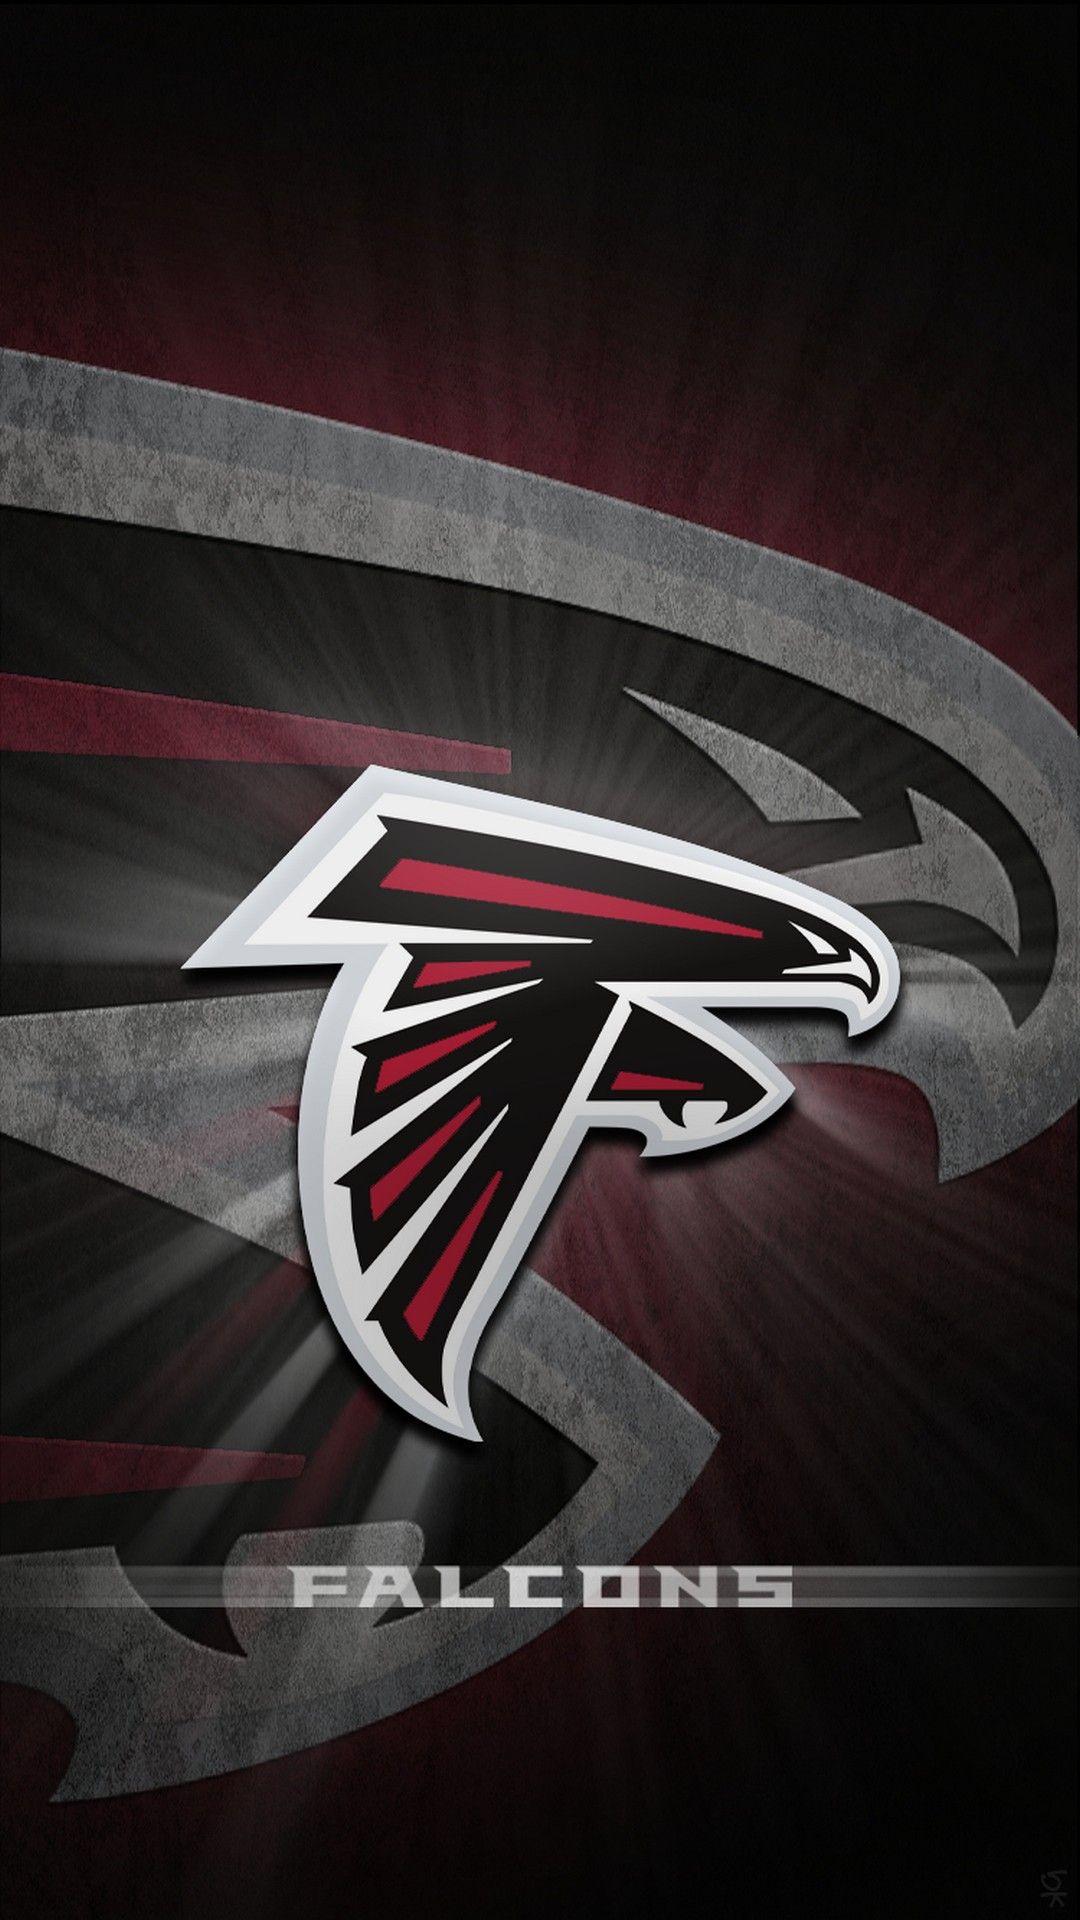 Atlanta Falcons Iphone Home Screen Wallpaper 2020 Atlanta